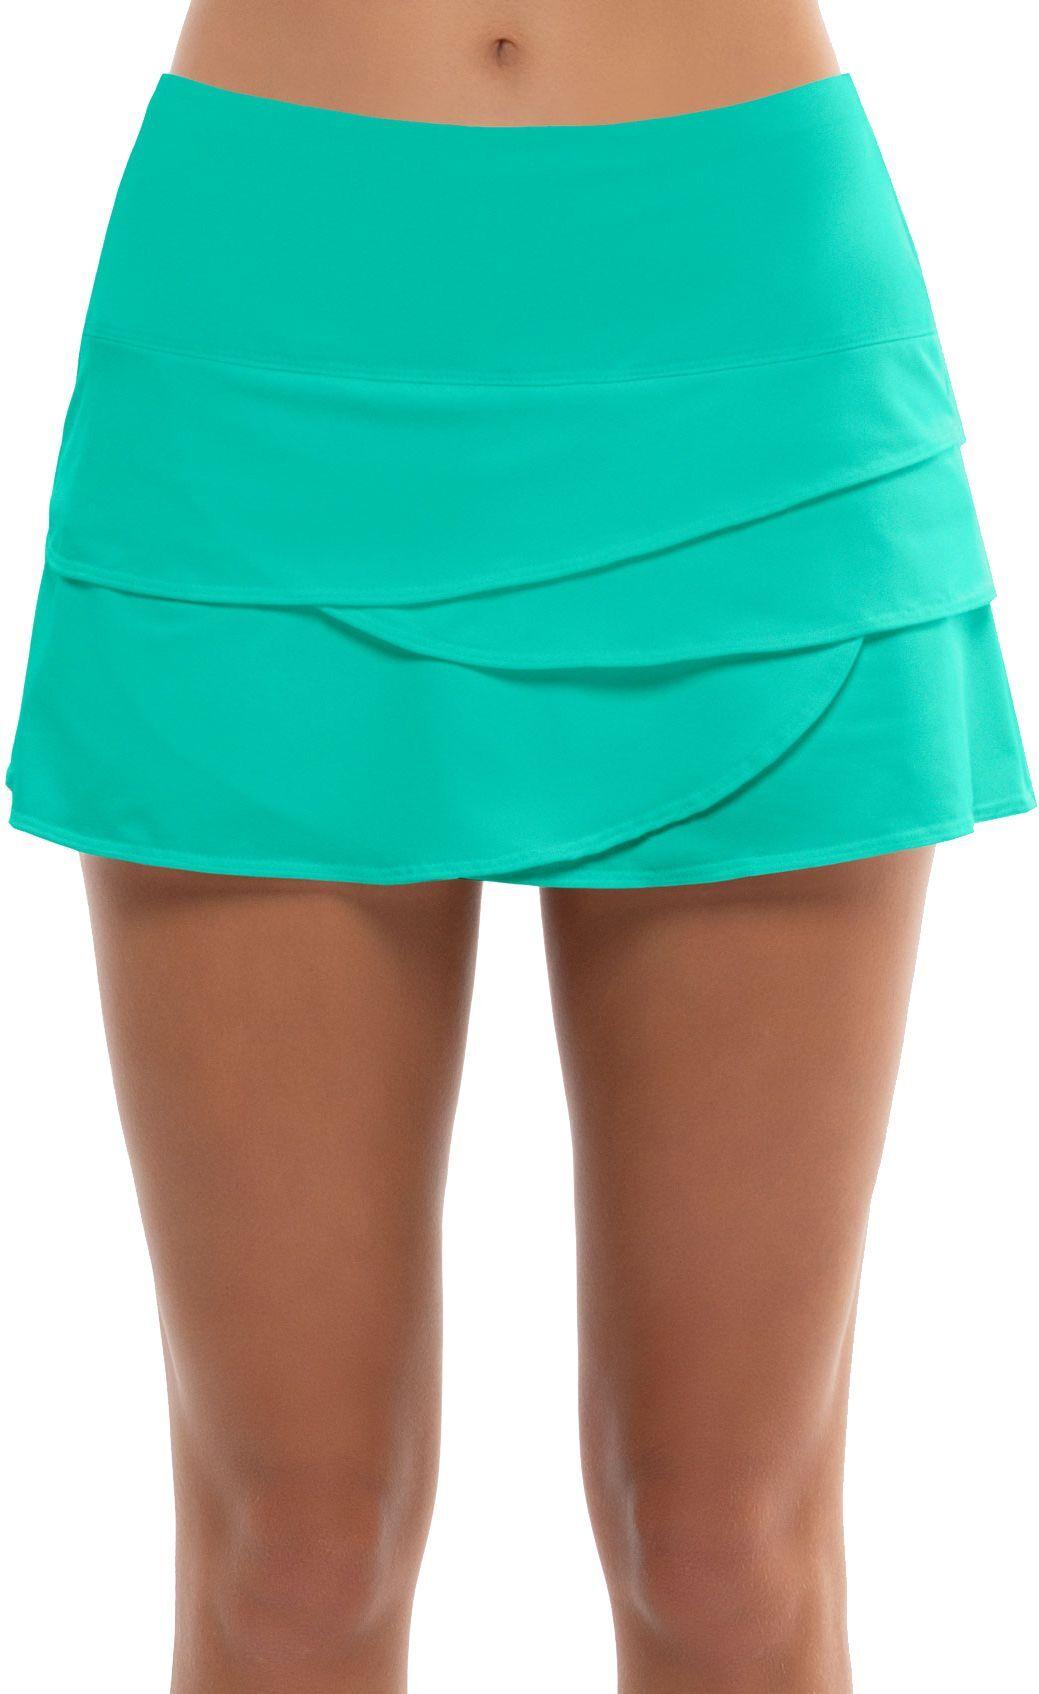 Lucky in Love Women's Scallop Tennis Skirt, Small, Aquamarine